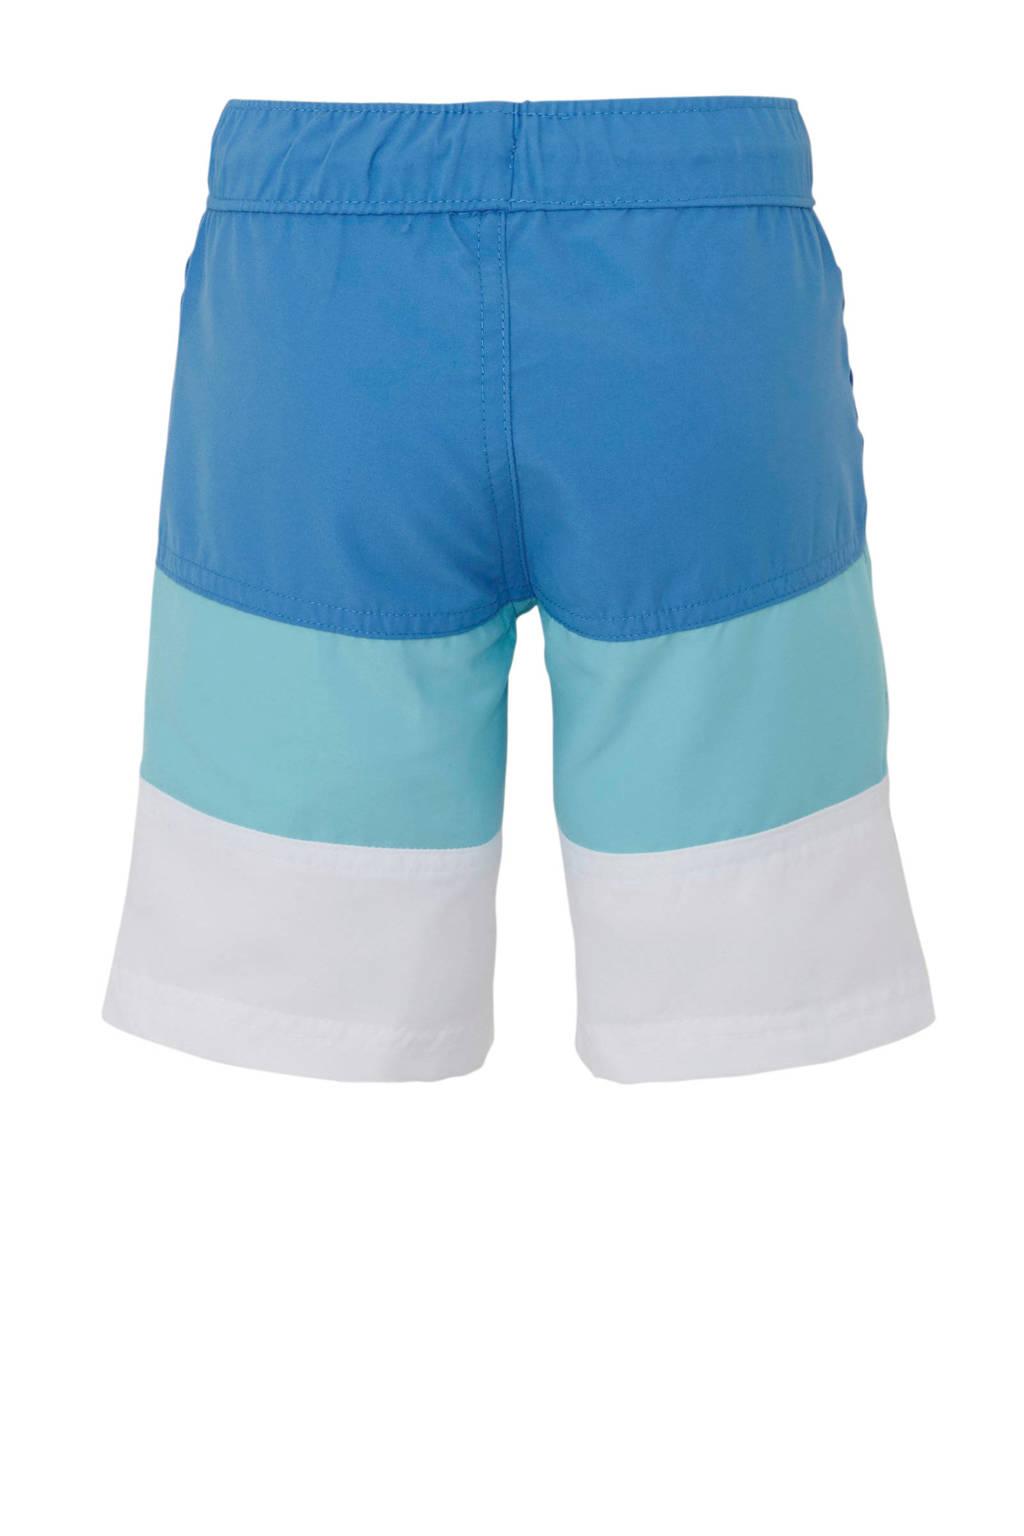 C&A Palomino zwemshort met kleurvlakken blauw, Blauw/wit